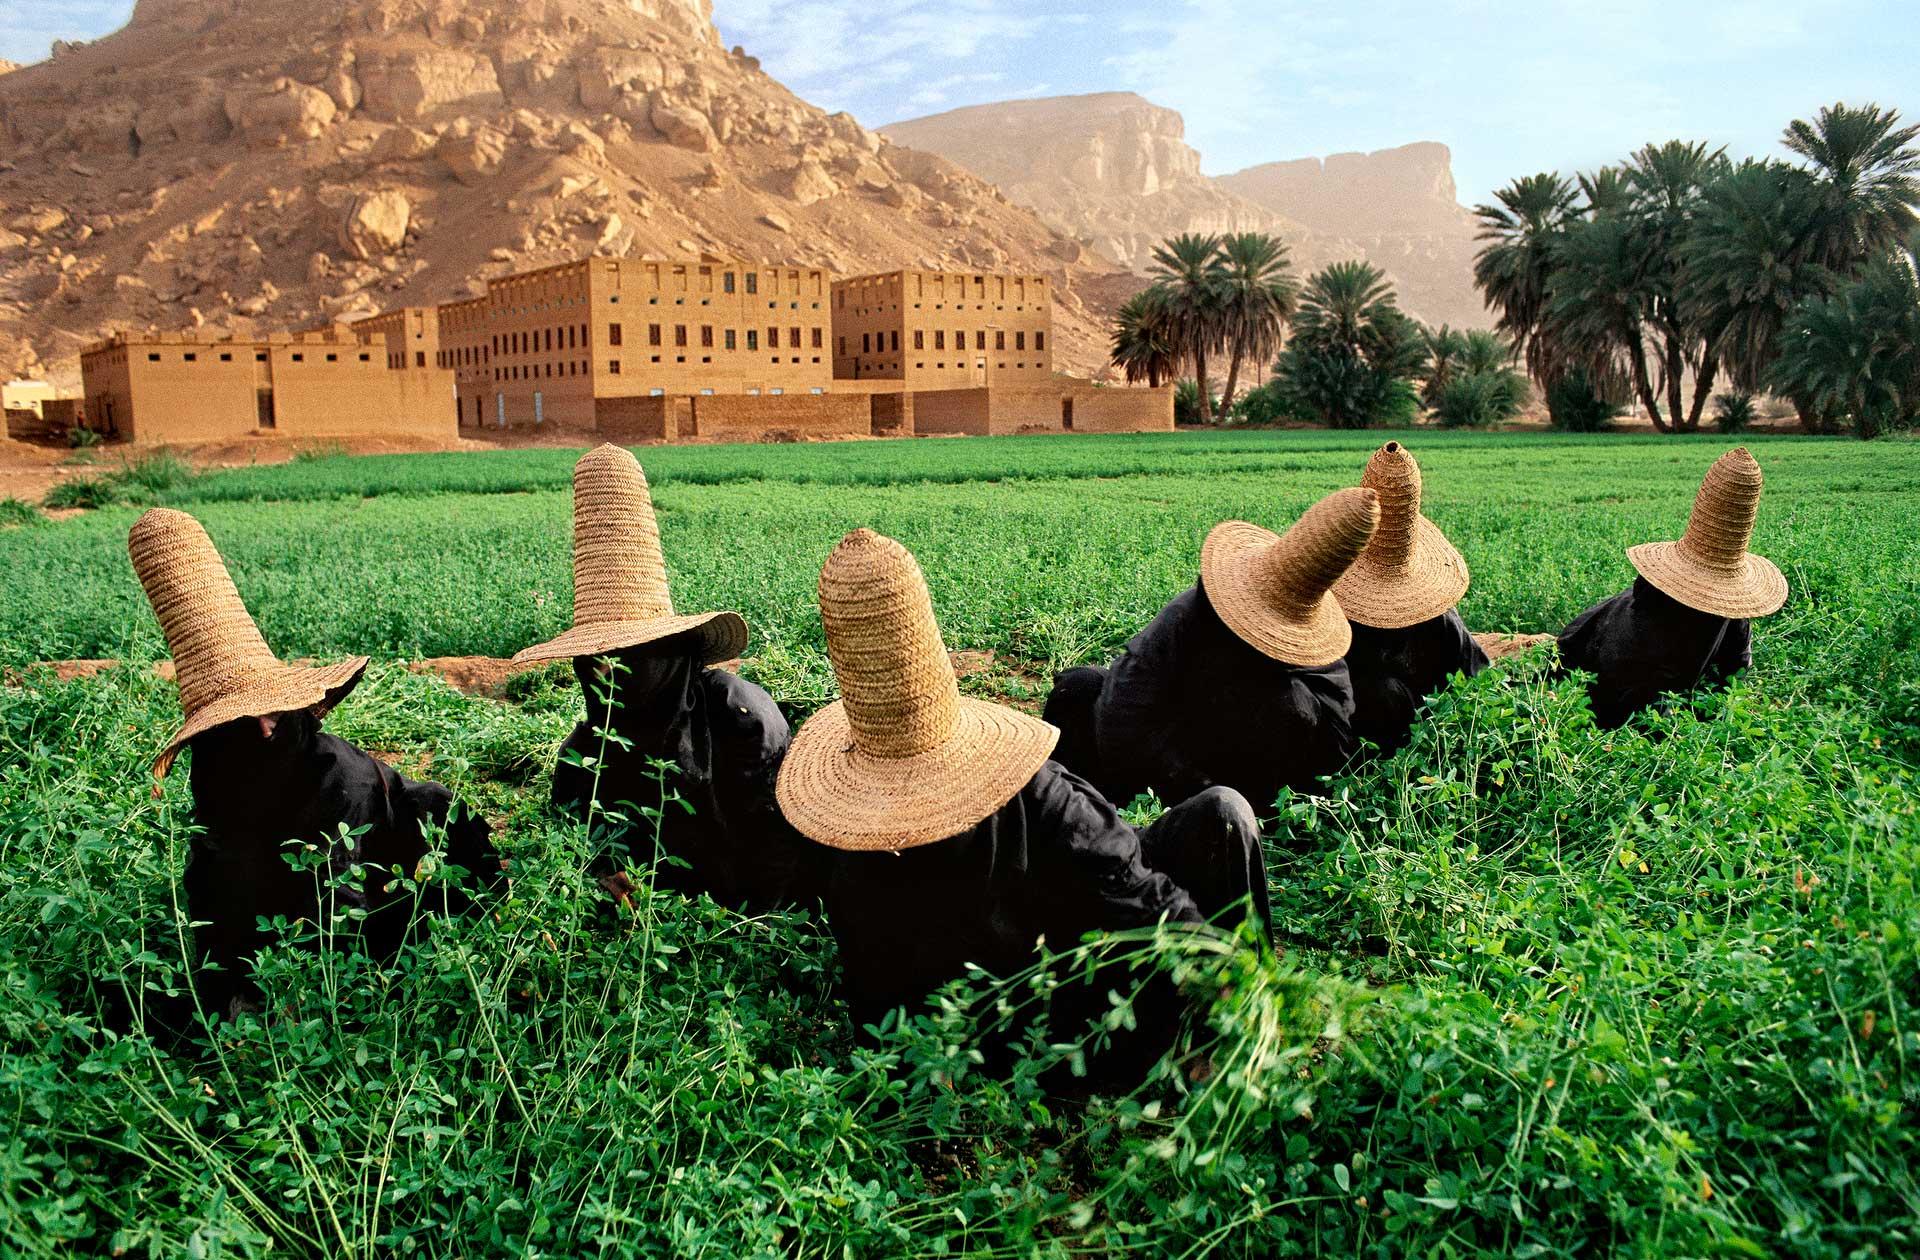 Clover gatherers in Yemen